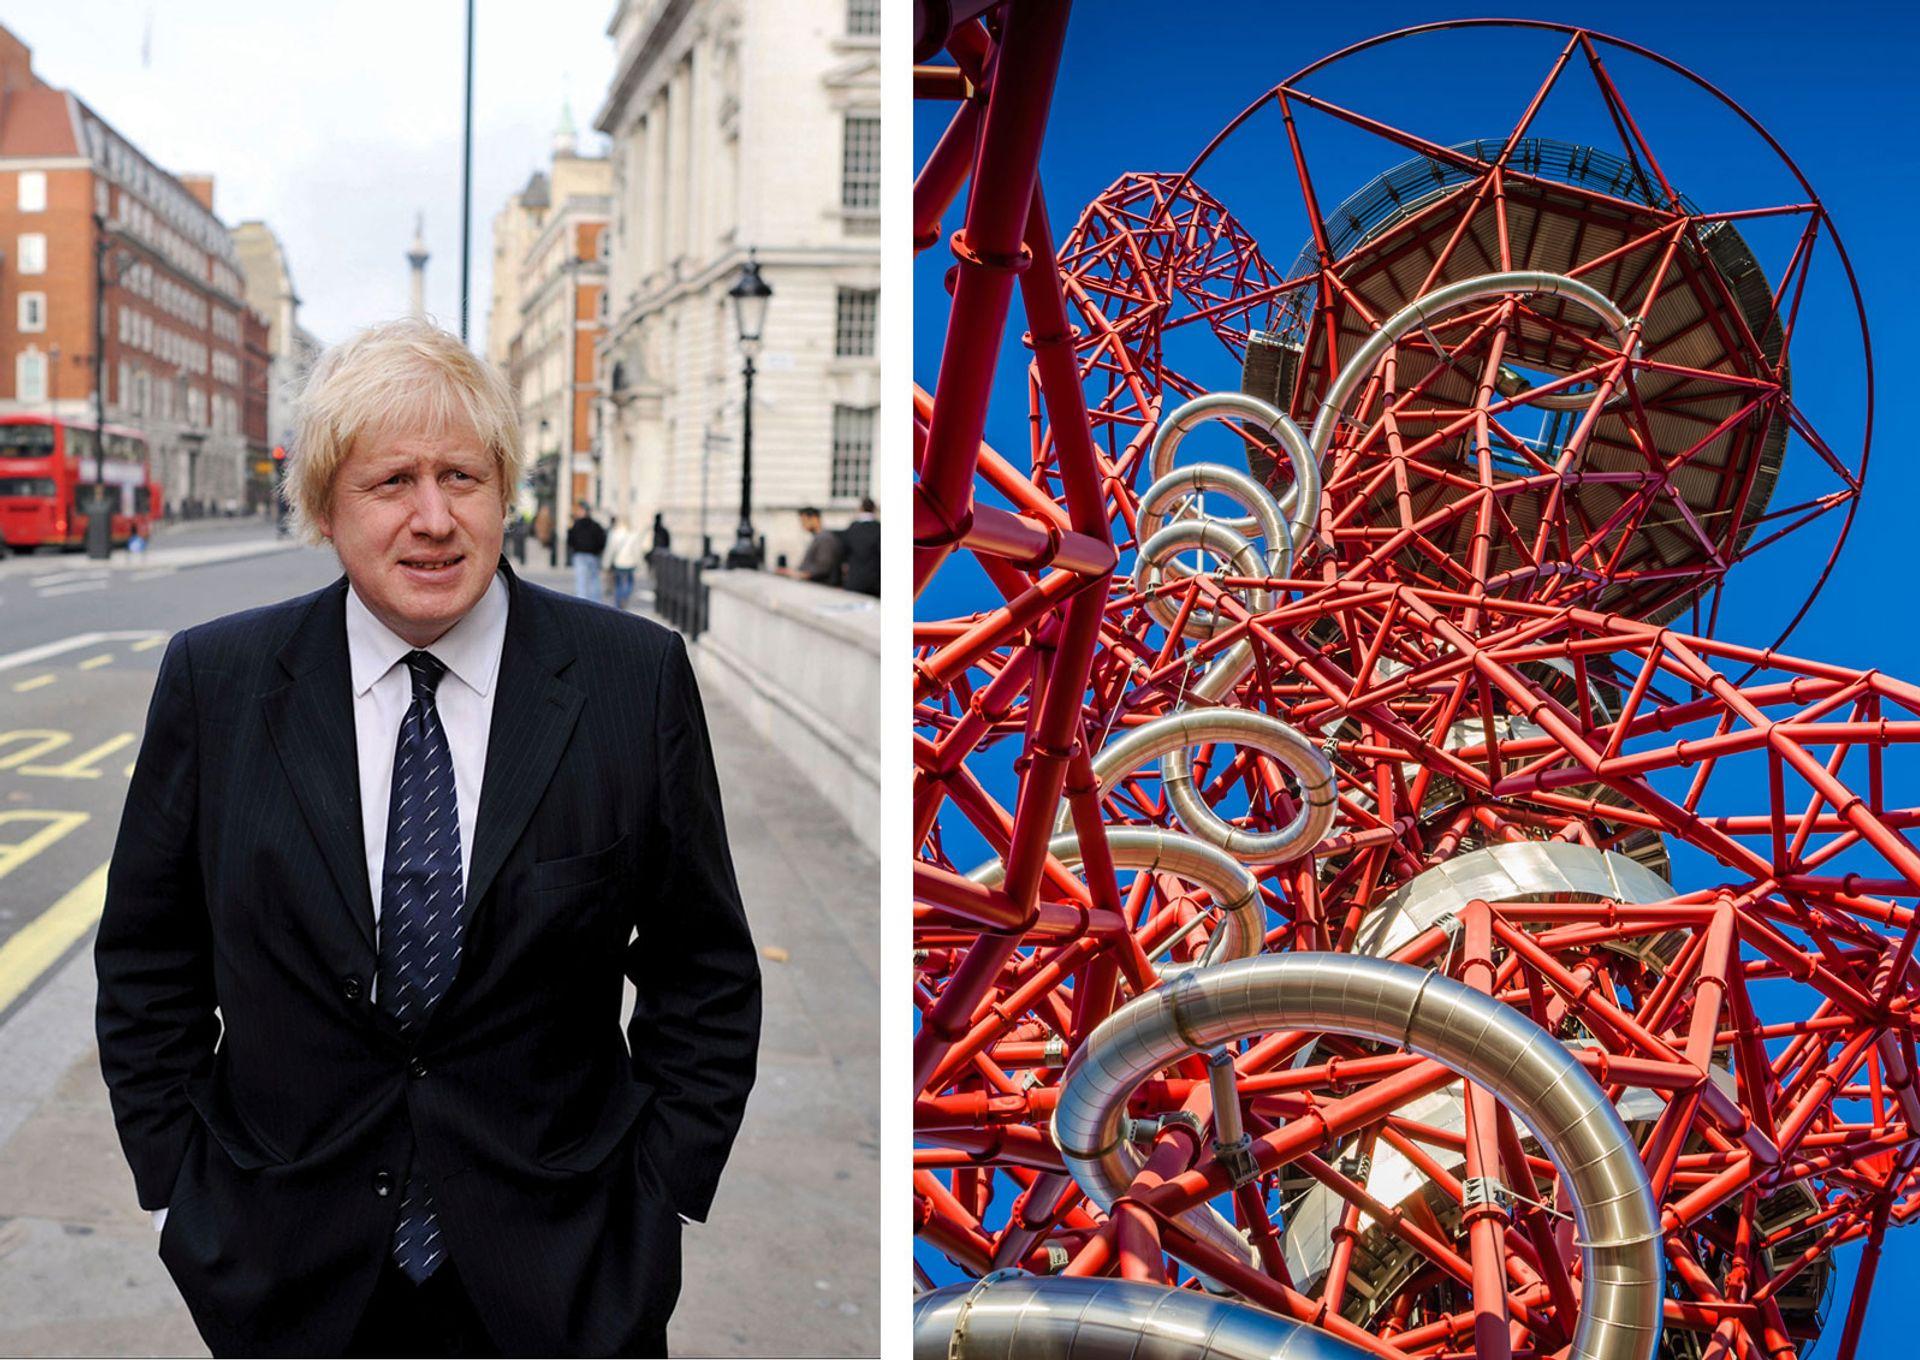 Debt on Boris Johnson's flagship art project ArcelorMittal Orbit has spiralled to £13m © Boris Johnson: Andrew Parsons/ i-Images; ArcelorMittal Orbit: courtesy of Frank Da Silva Photography.